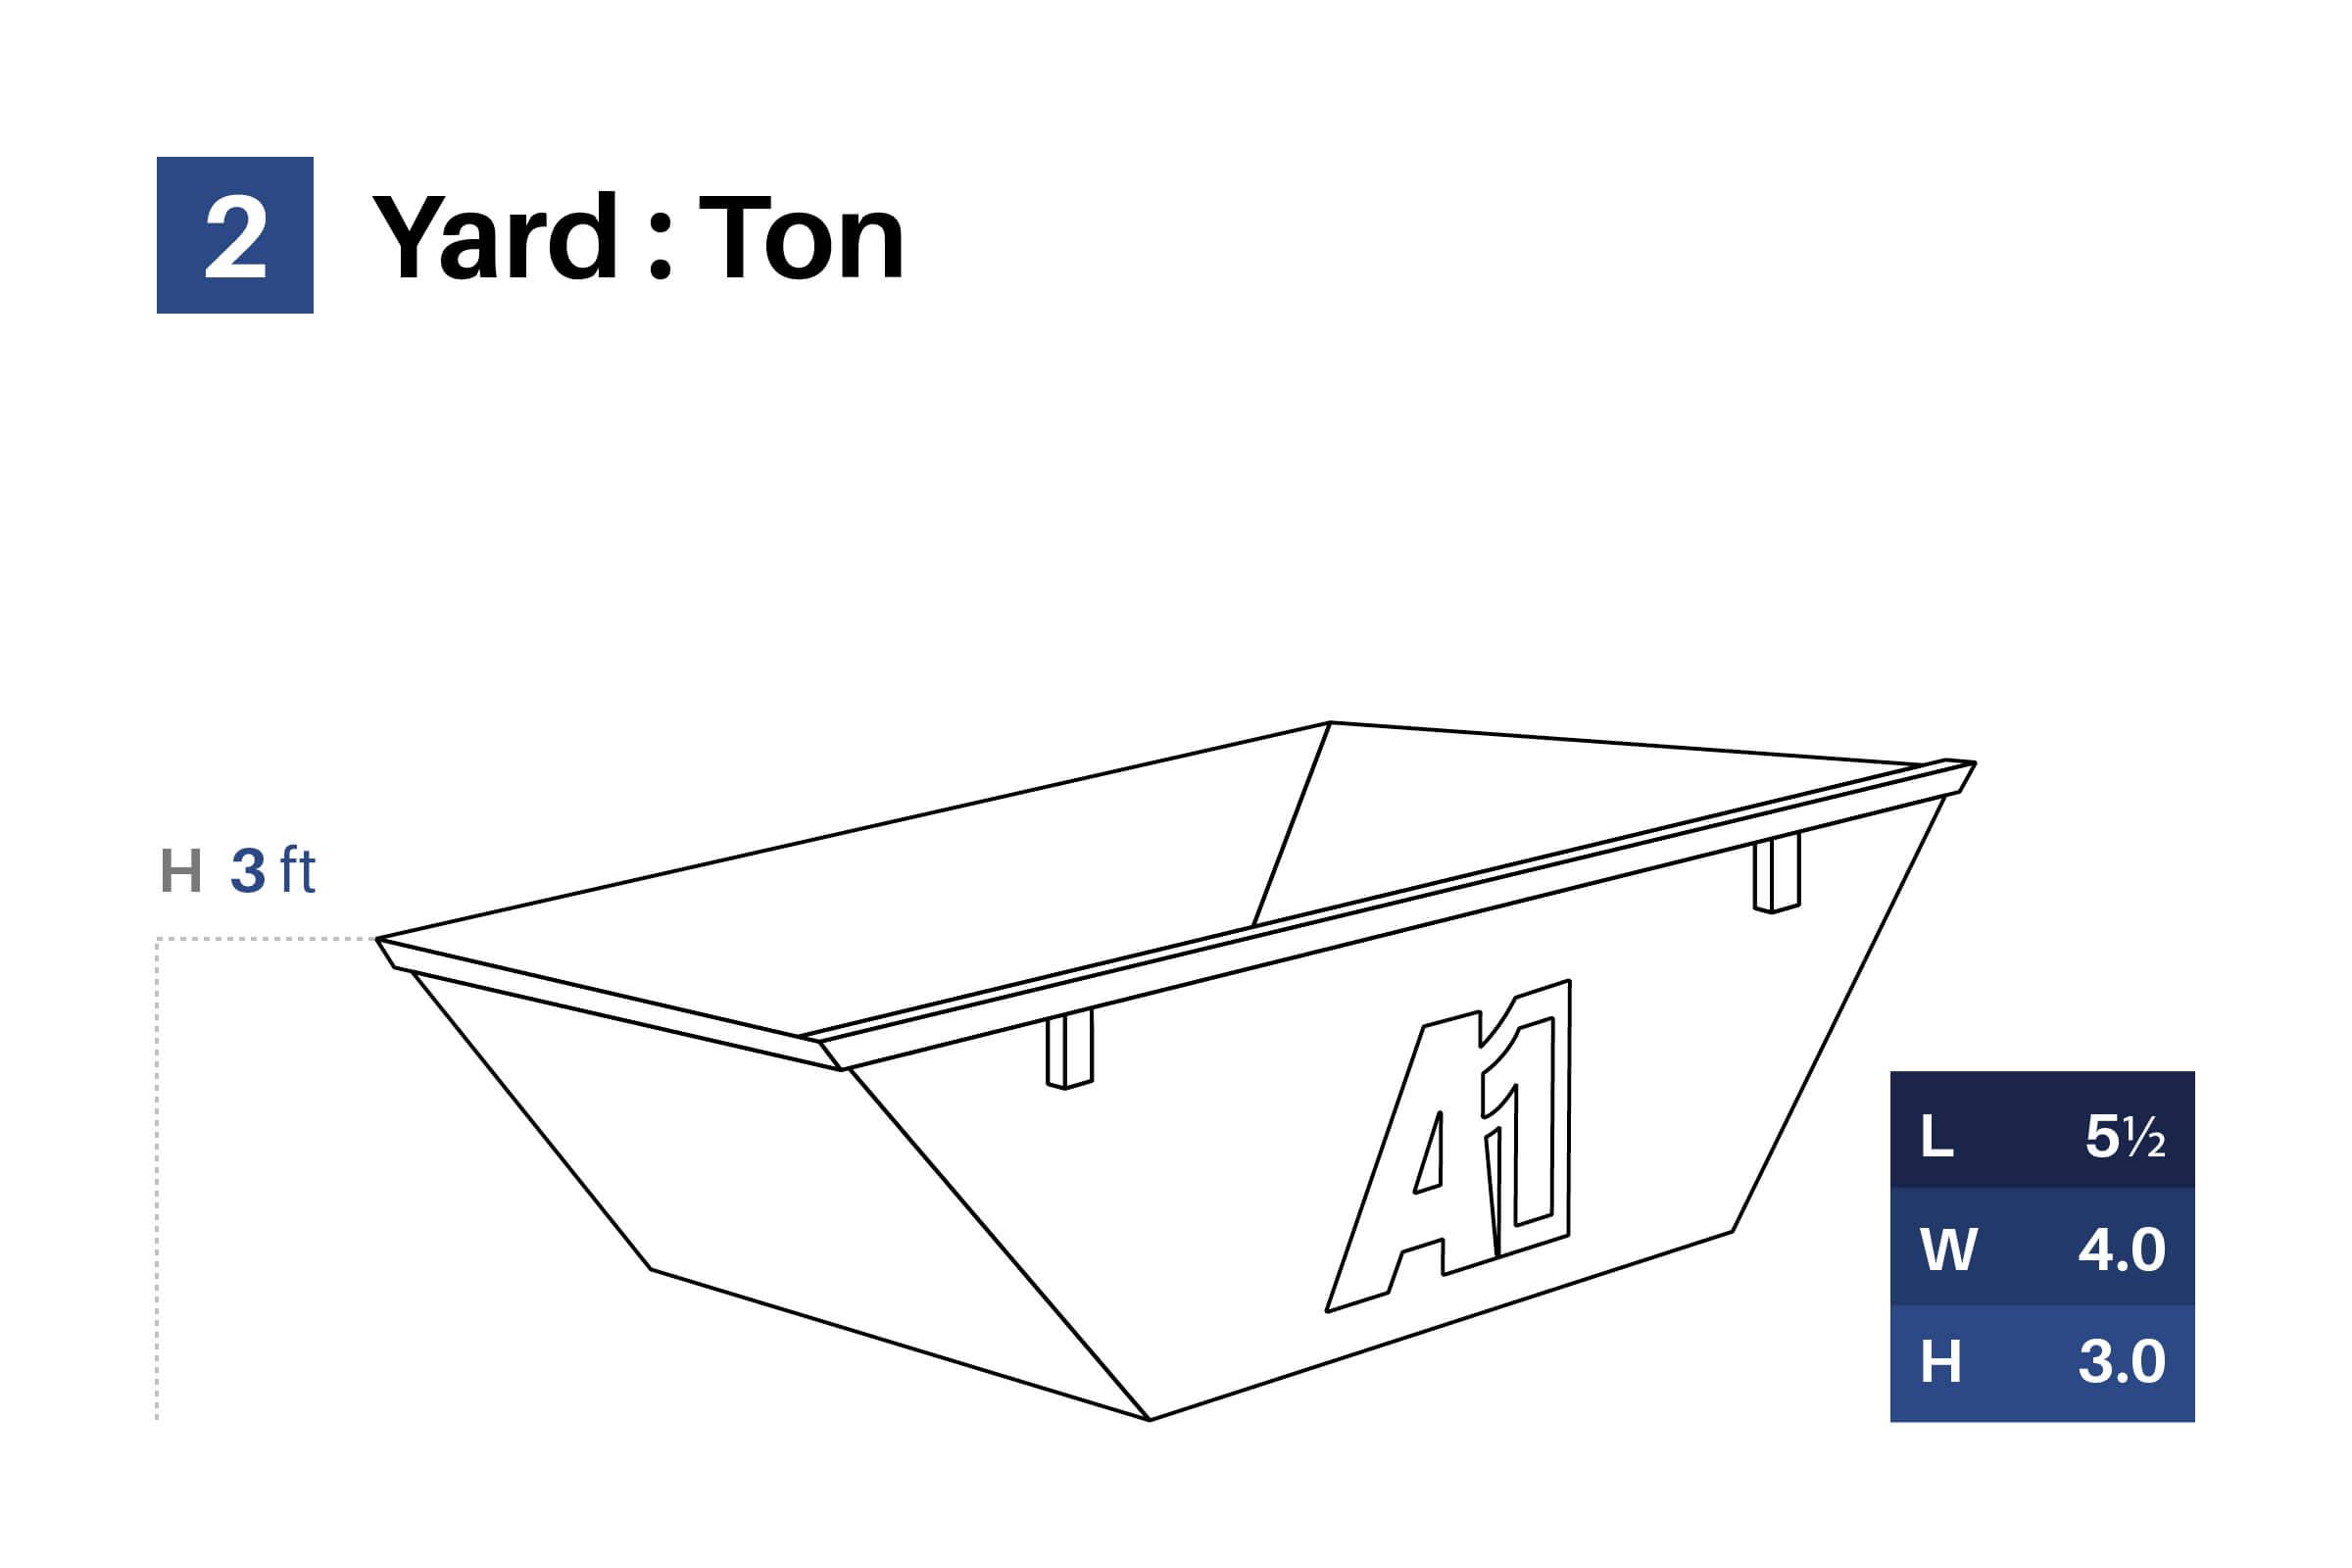 a1skip-hire-2yard